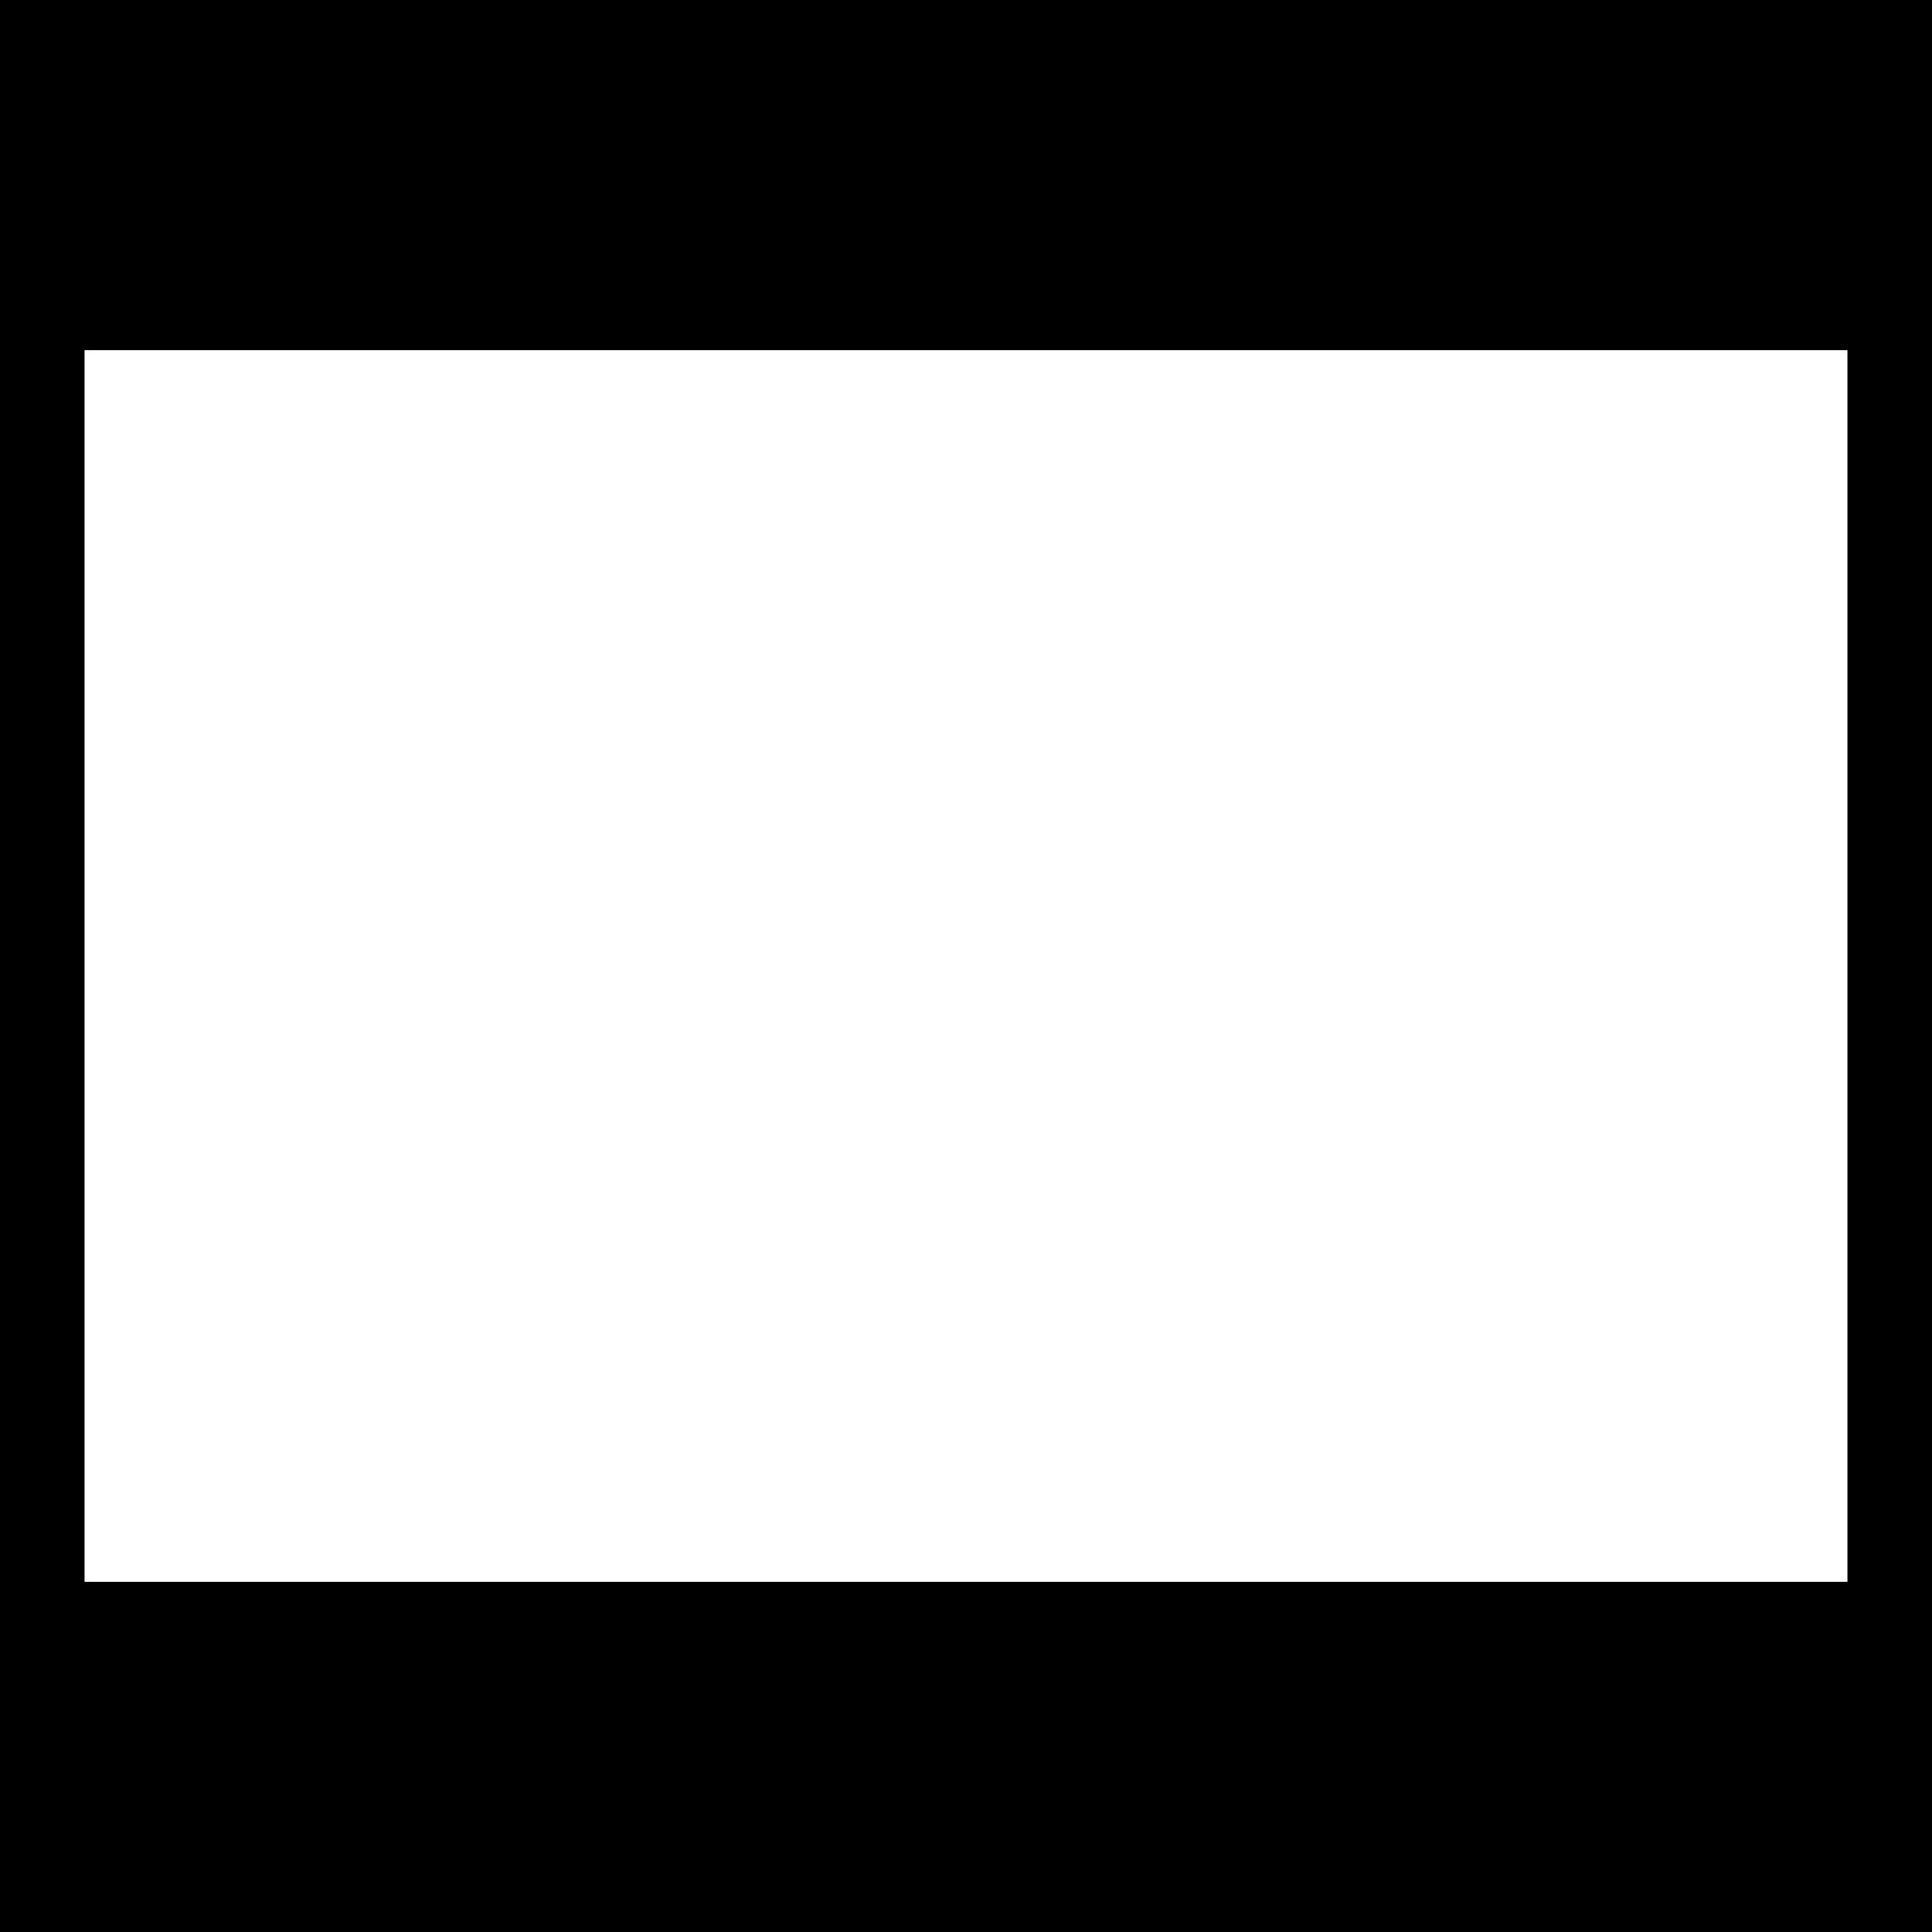 EDF GDF Logo PNG Transparent & SVG Vector.